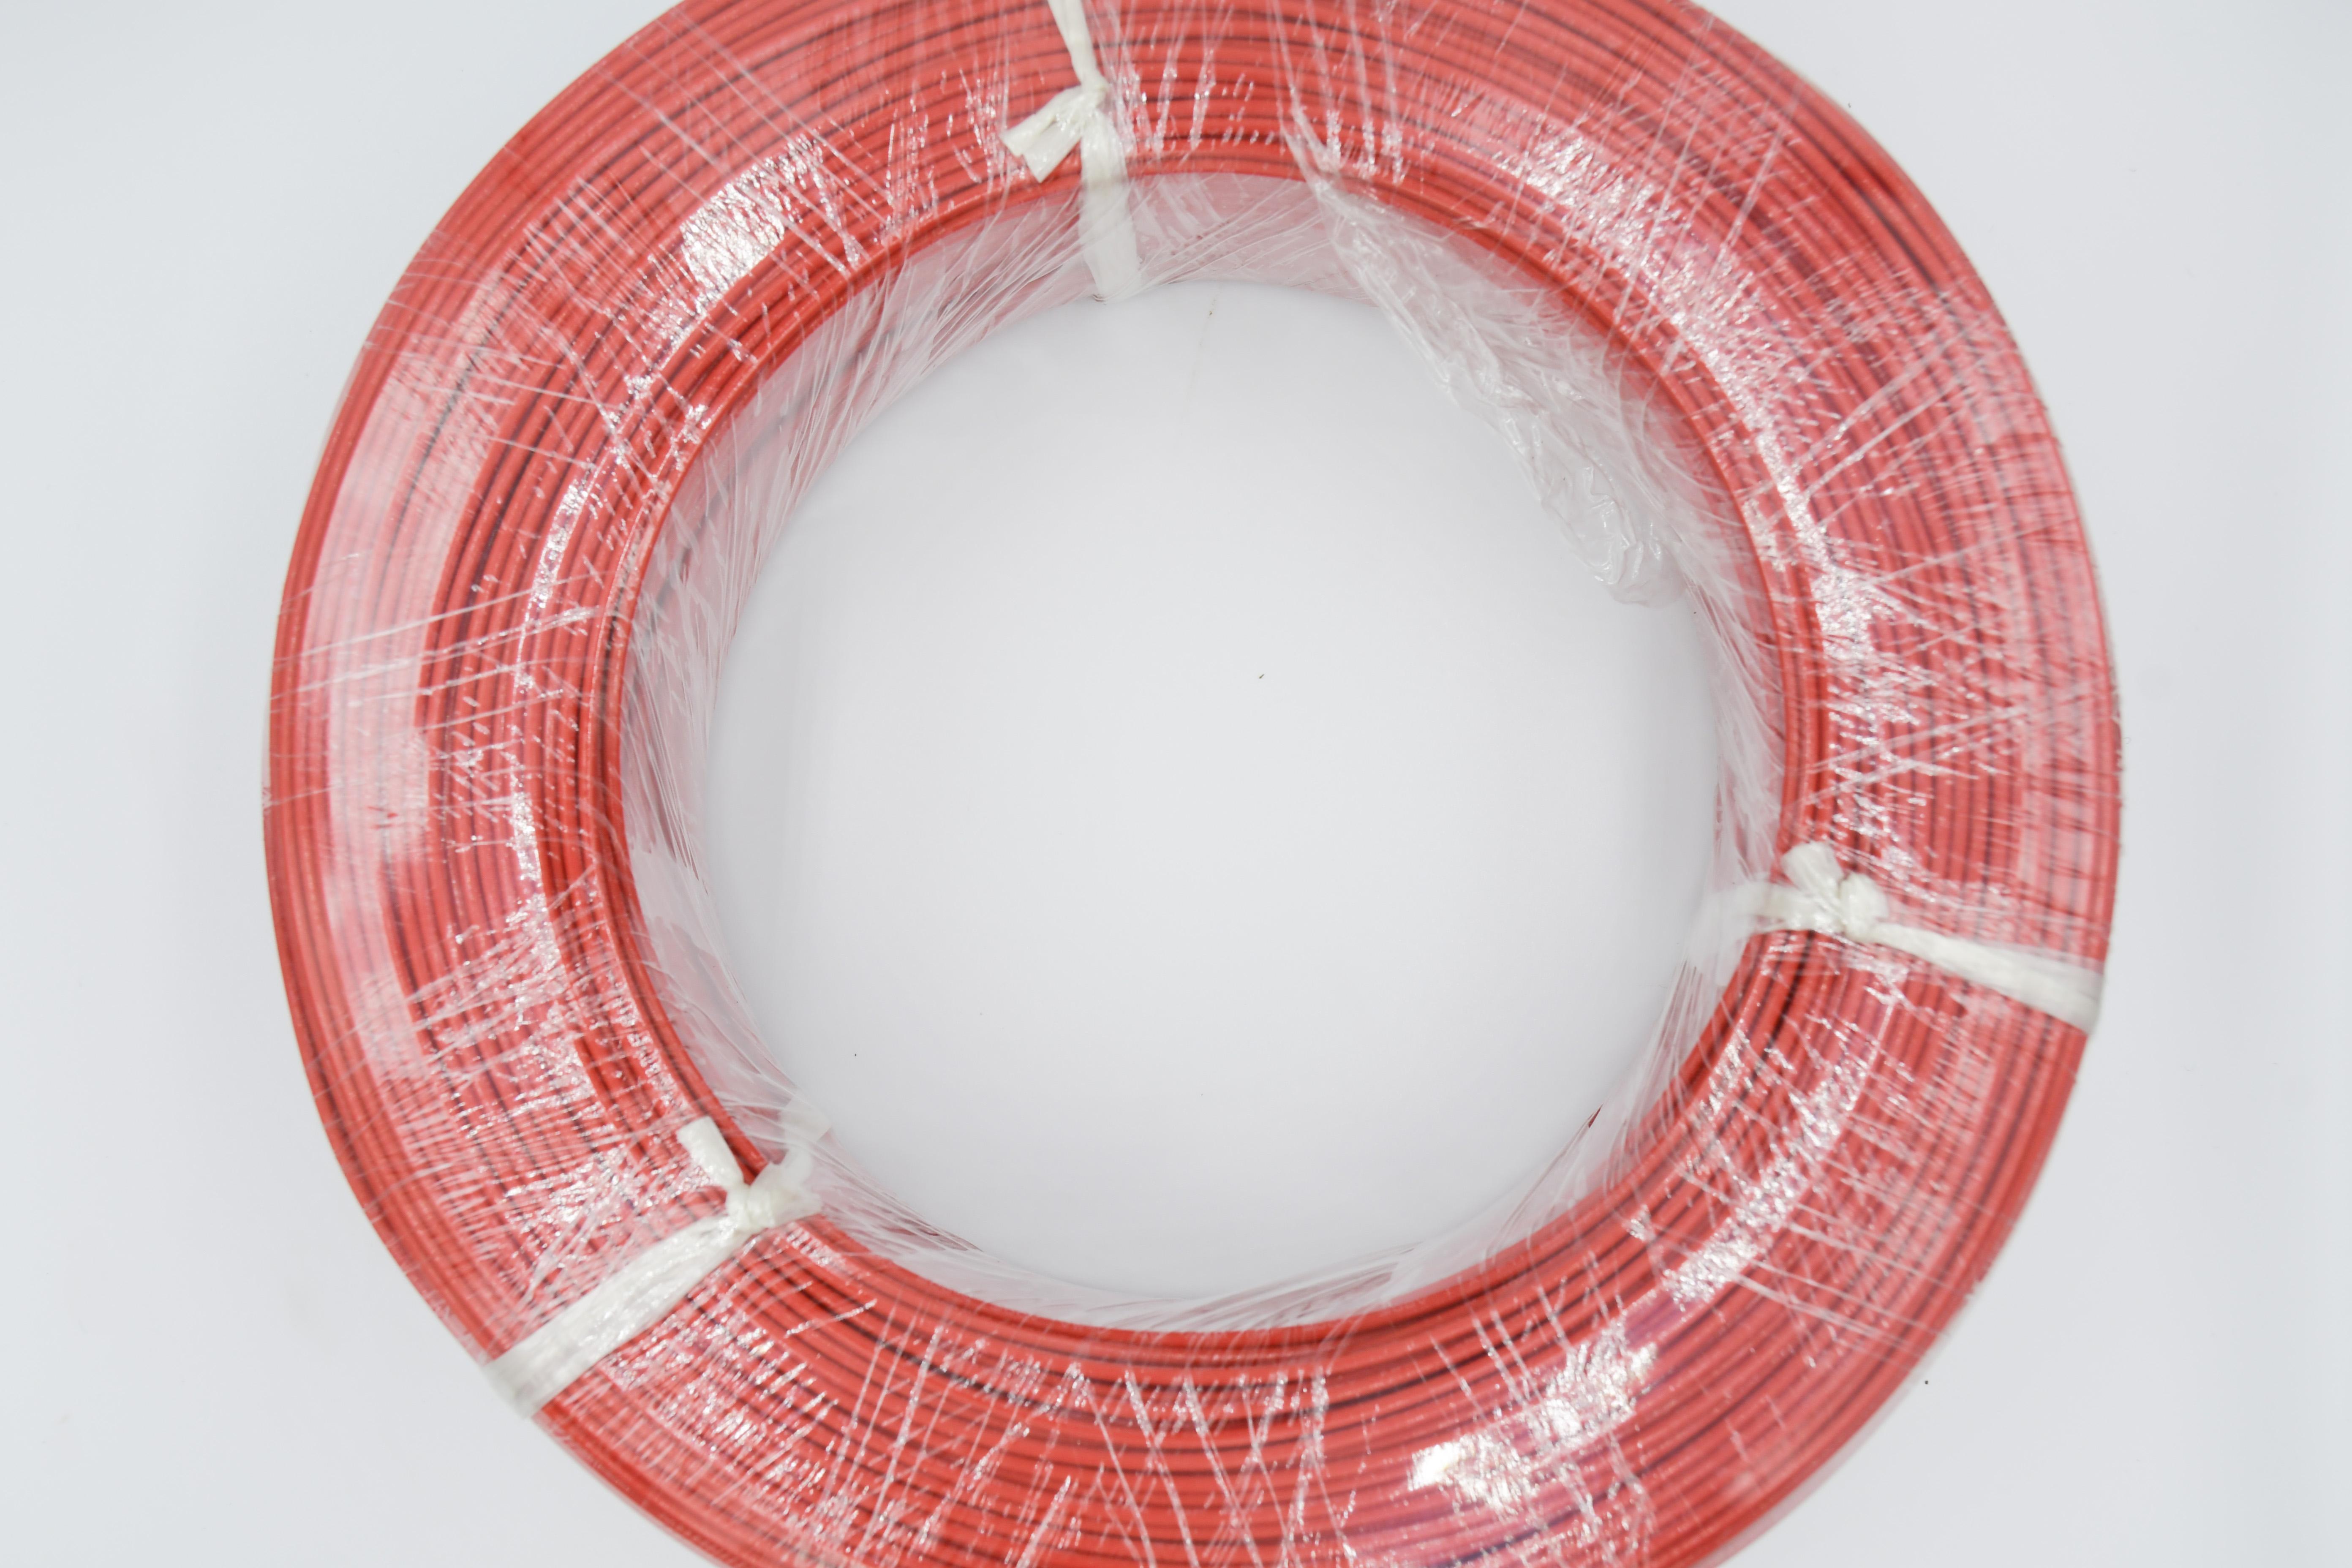 UL1330/1331/1332 FEP Insulation Wire Tinned copper No.1